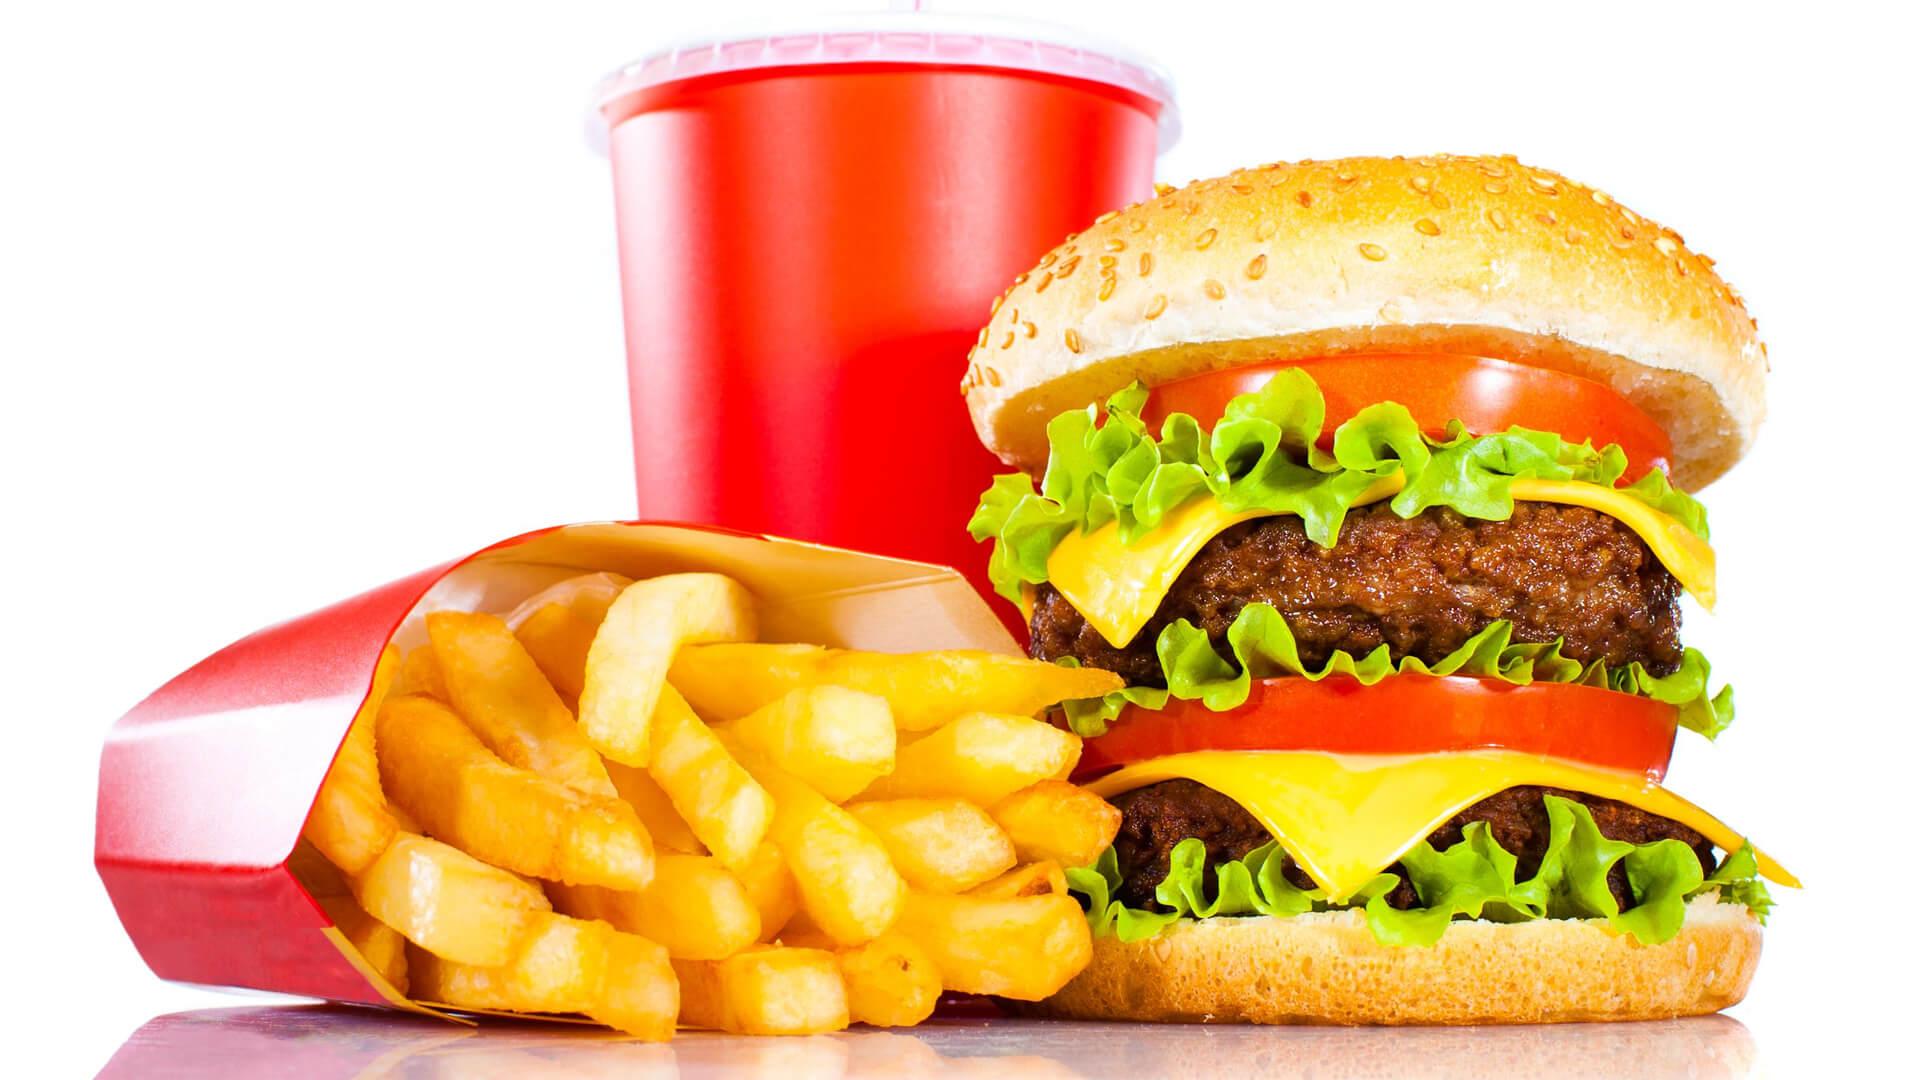 fast food desktop wallpaper 74108